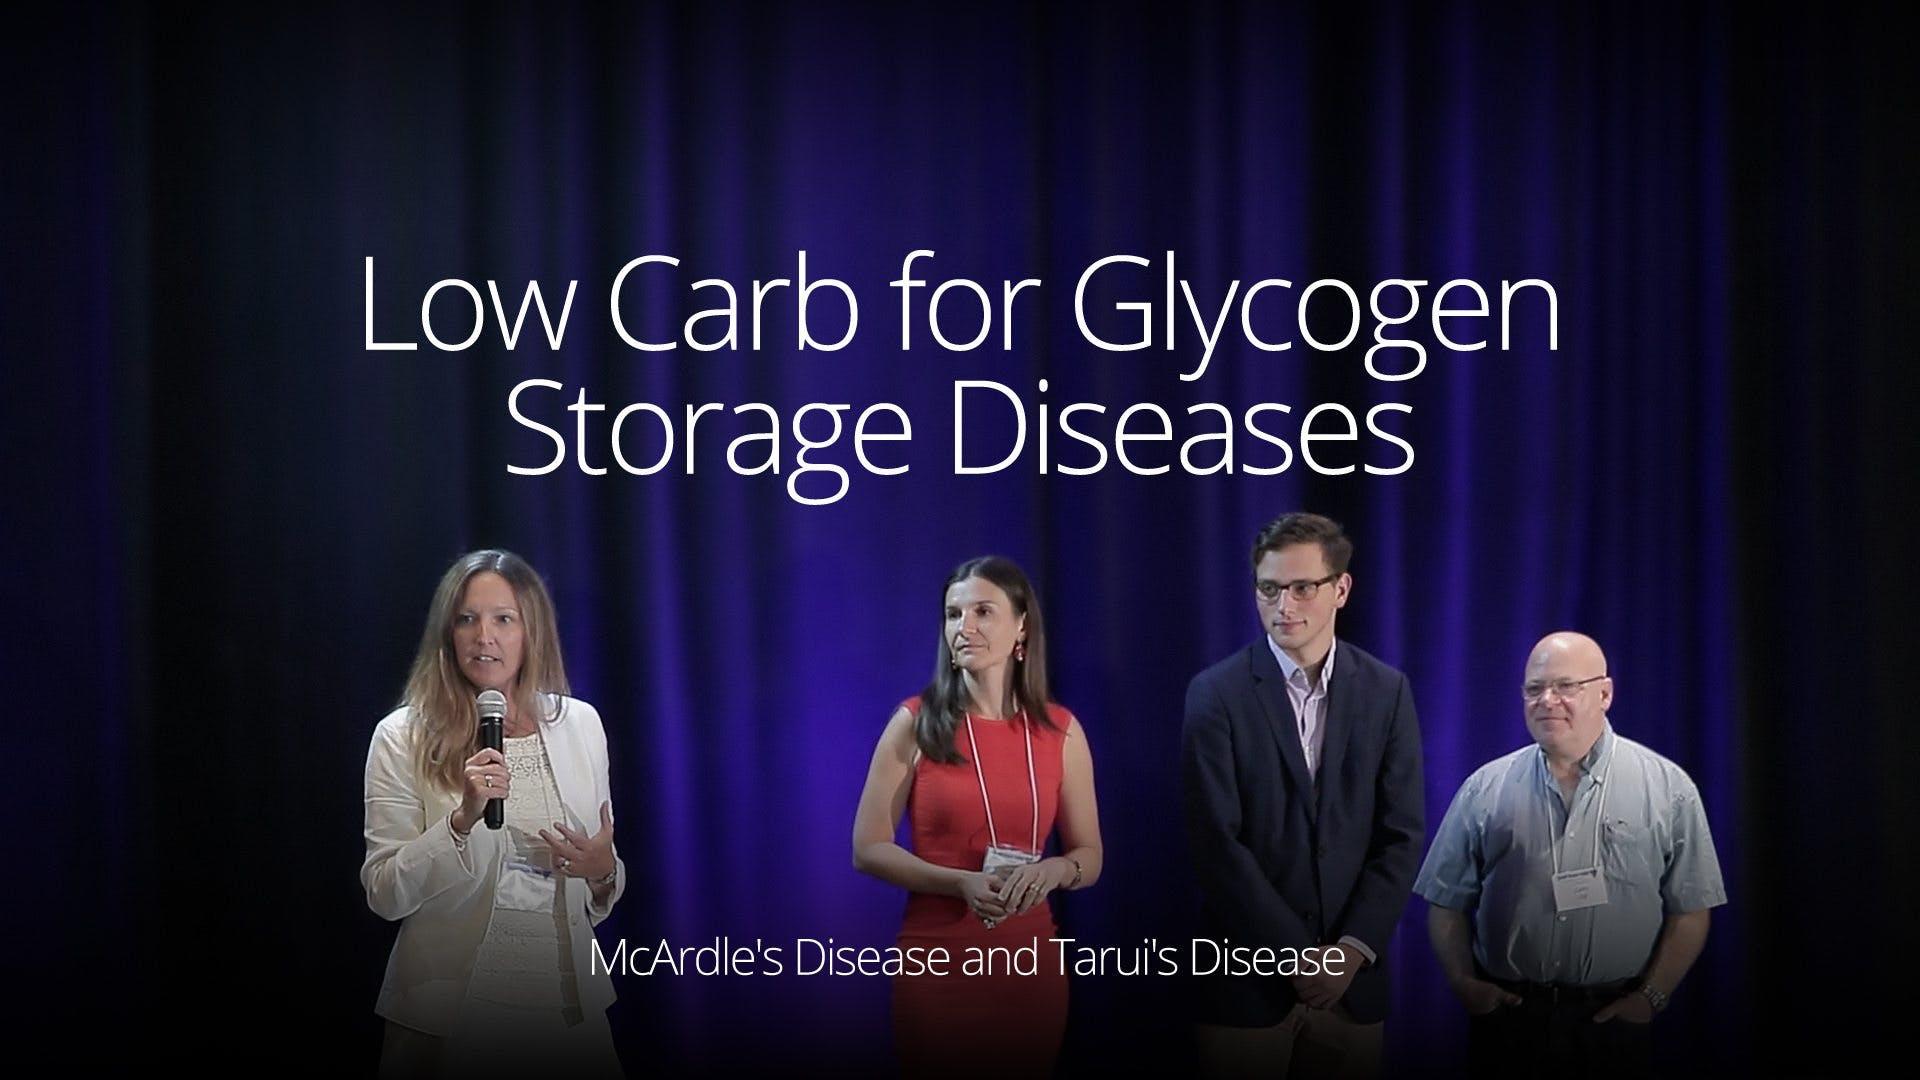 Low Carb for Glycogen Storage Diseases - McArdle Disease (SD 2016)